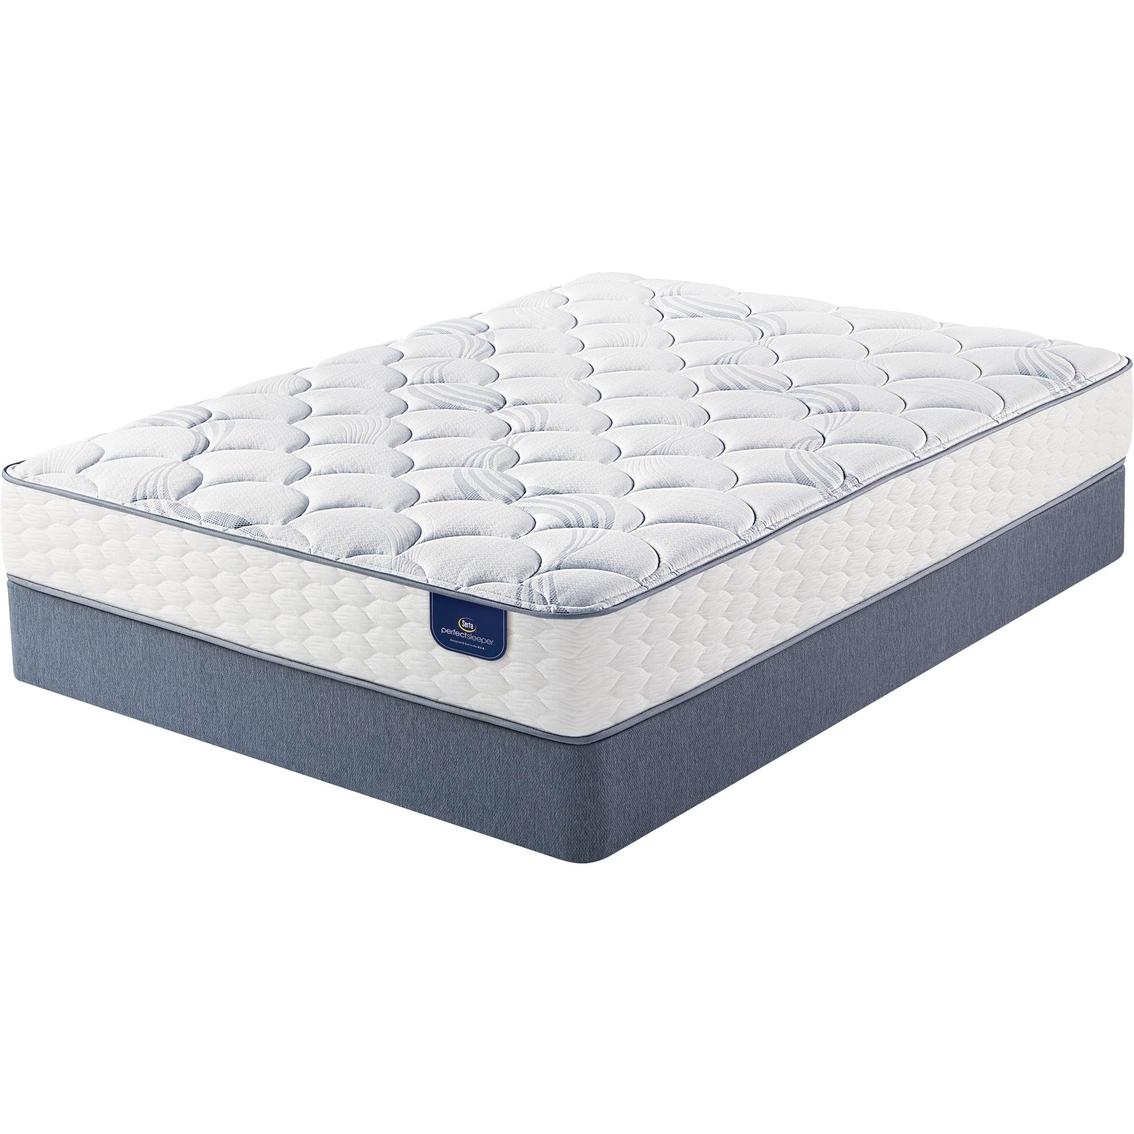 serta office chair 10 year warranty folding with armrest perfect sleeper overbrook plush mattress set